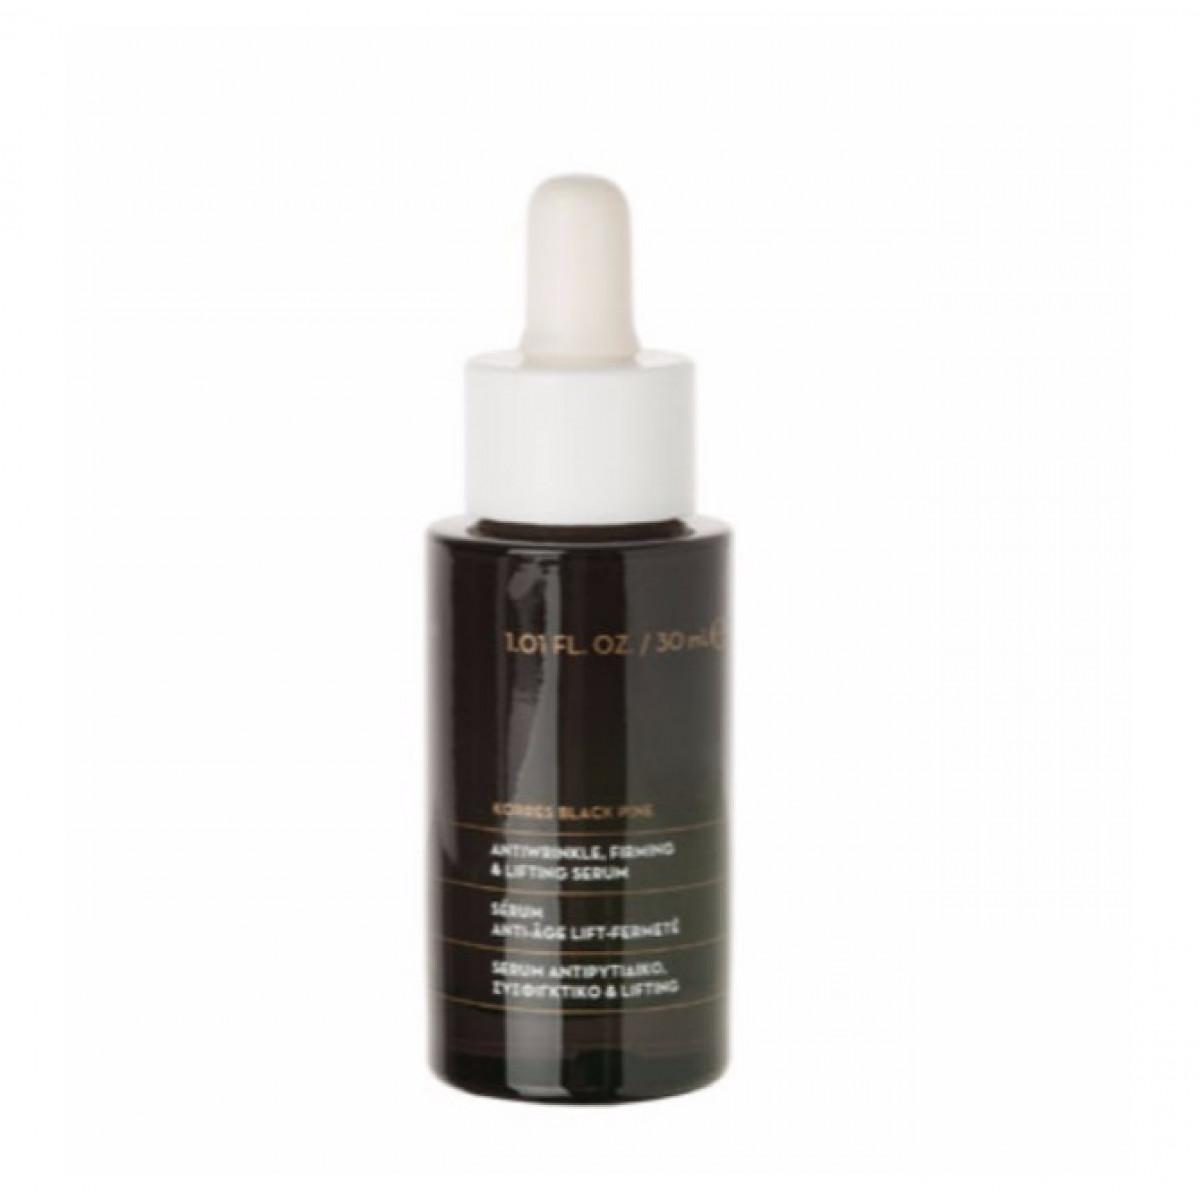 558551a946 -25% Korres Black Pine 3D Ανόρθωση περιγράμματος   Ολική Σύσφιξη Serum 30ml